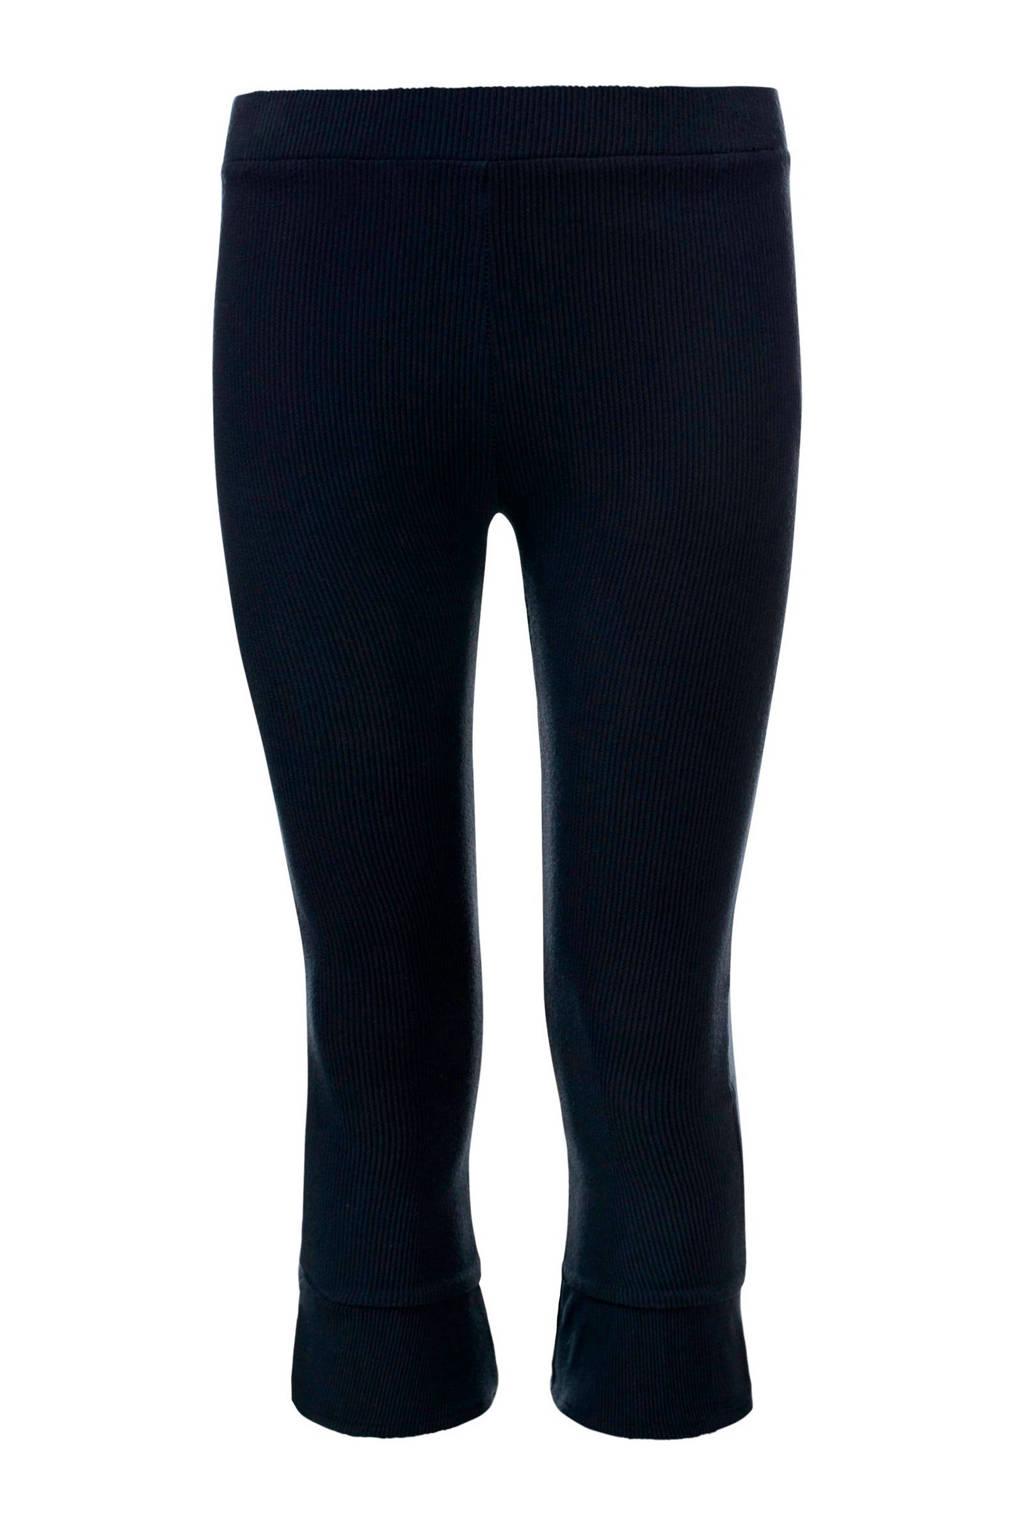 LOOXS Little broek donkerblauw, Donkerblauw